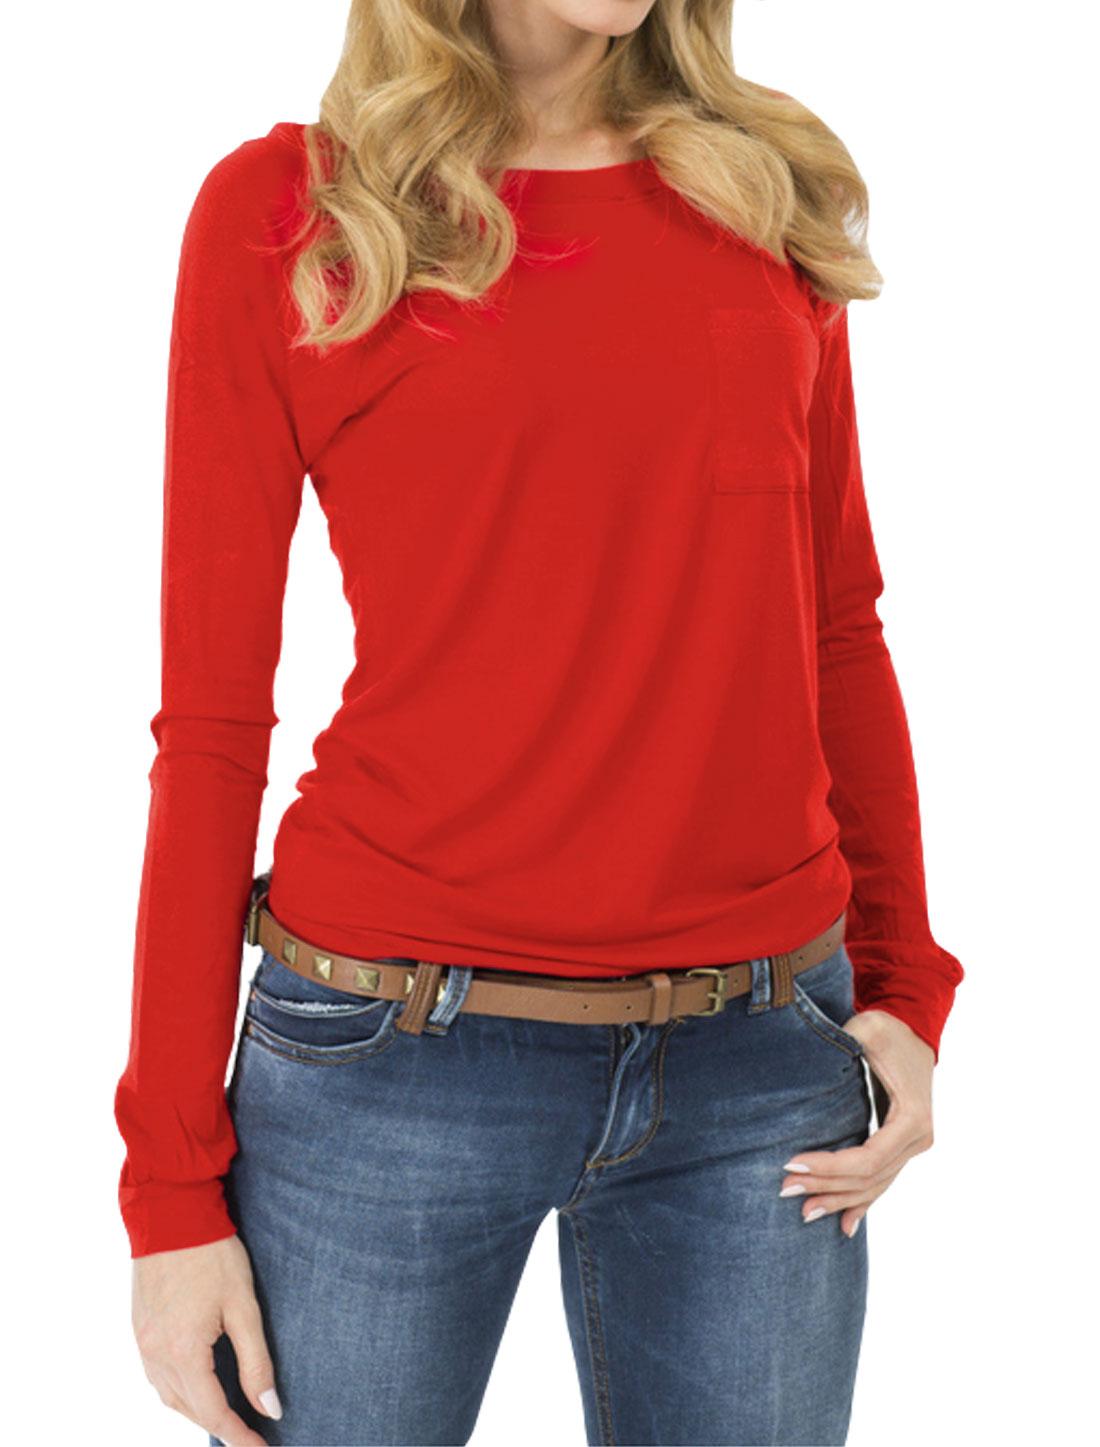 Women Raglan Sleeves Slim Fit Tee Shirt w Pocket Red M